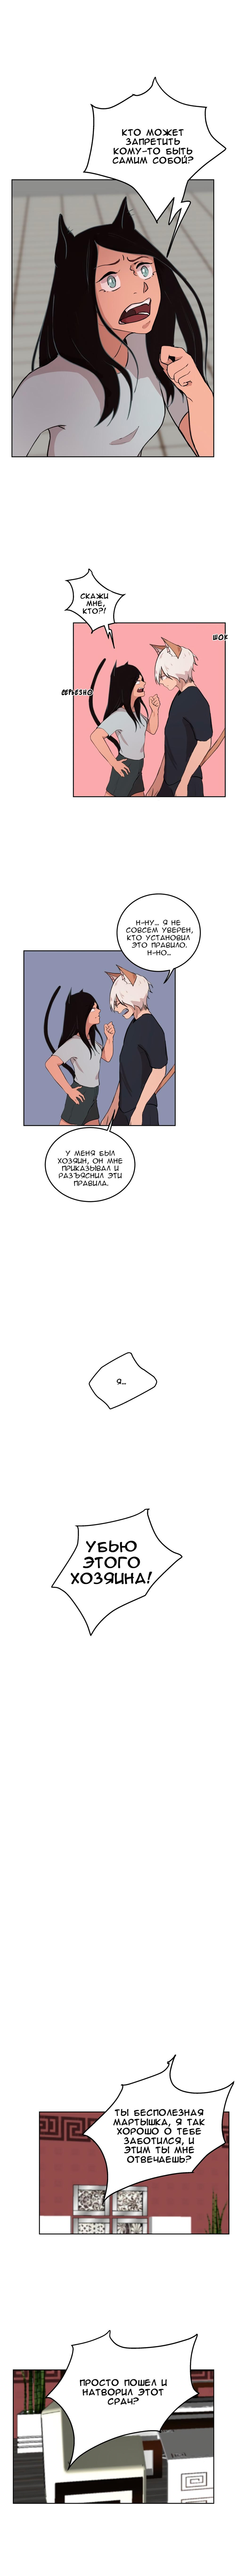 https://r1.ninemanga.com/comics/pic2/58/31802/416859/1533717009173.jpg Page 4